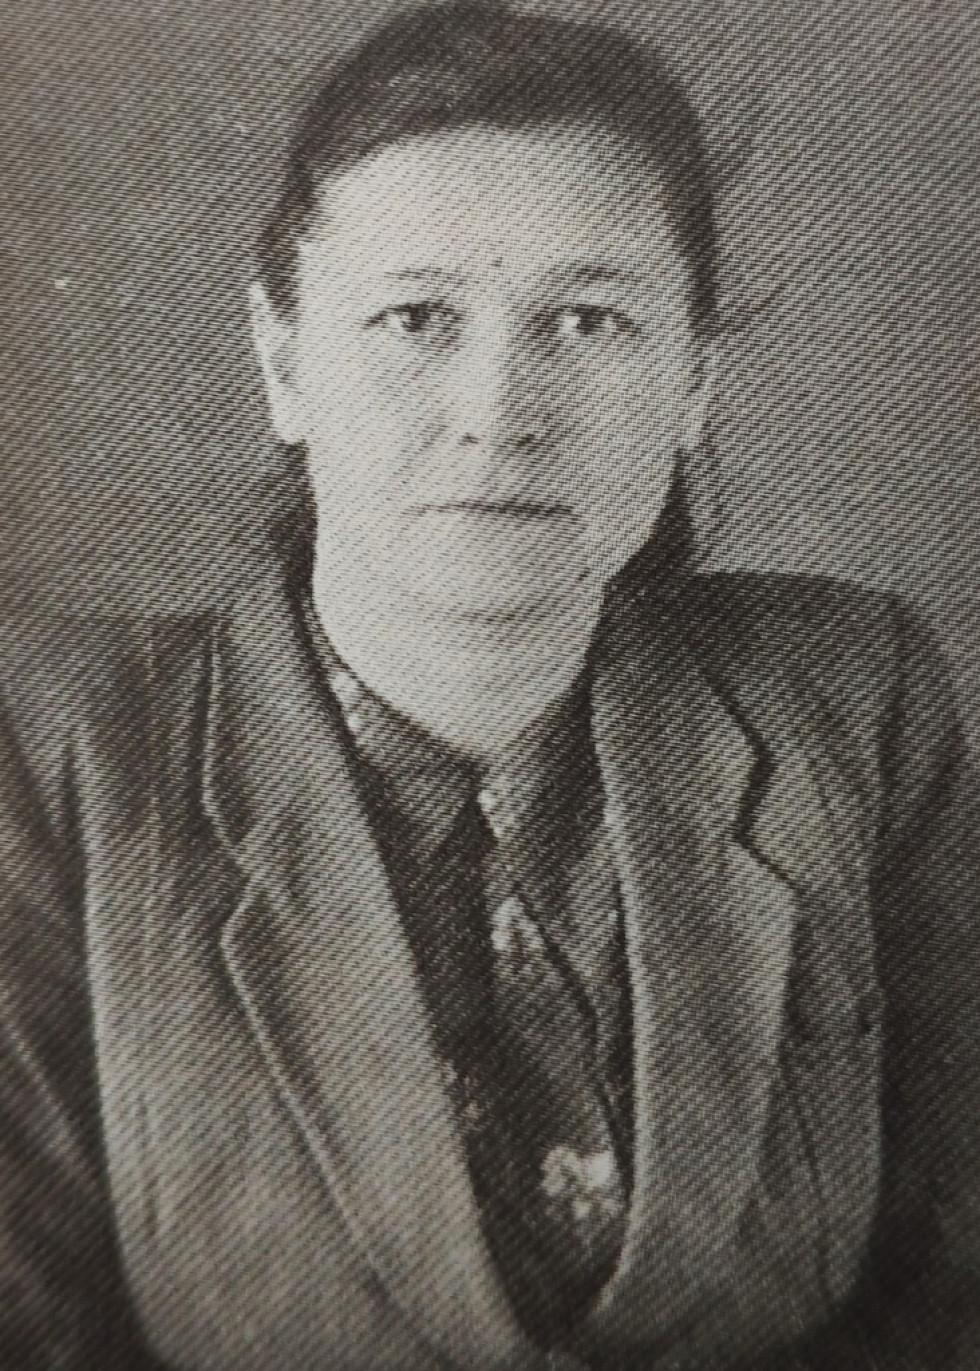 Людмила Барабаш, 1953 рік